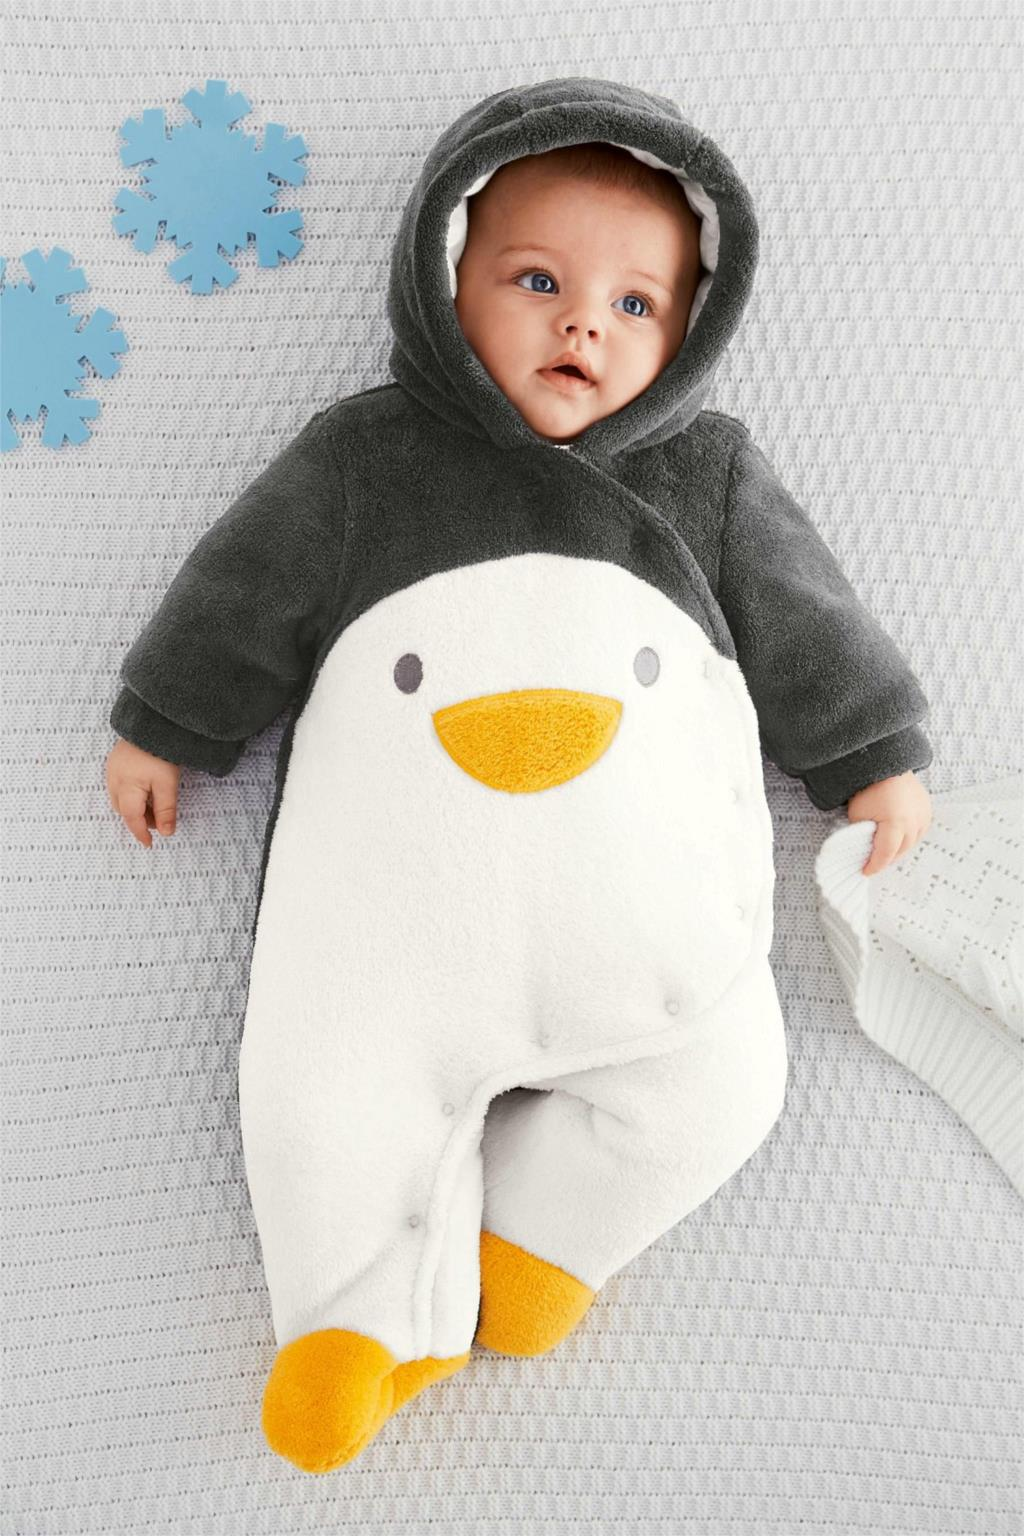 V-TREE NEW baby winter rompers fleece pajamas kids warm costume cute baby pajamas winter overalls for kids newborn snowsuit<br><br>Aliexpress